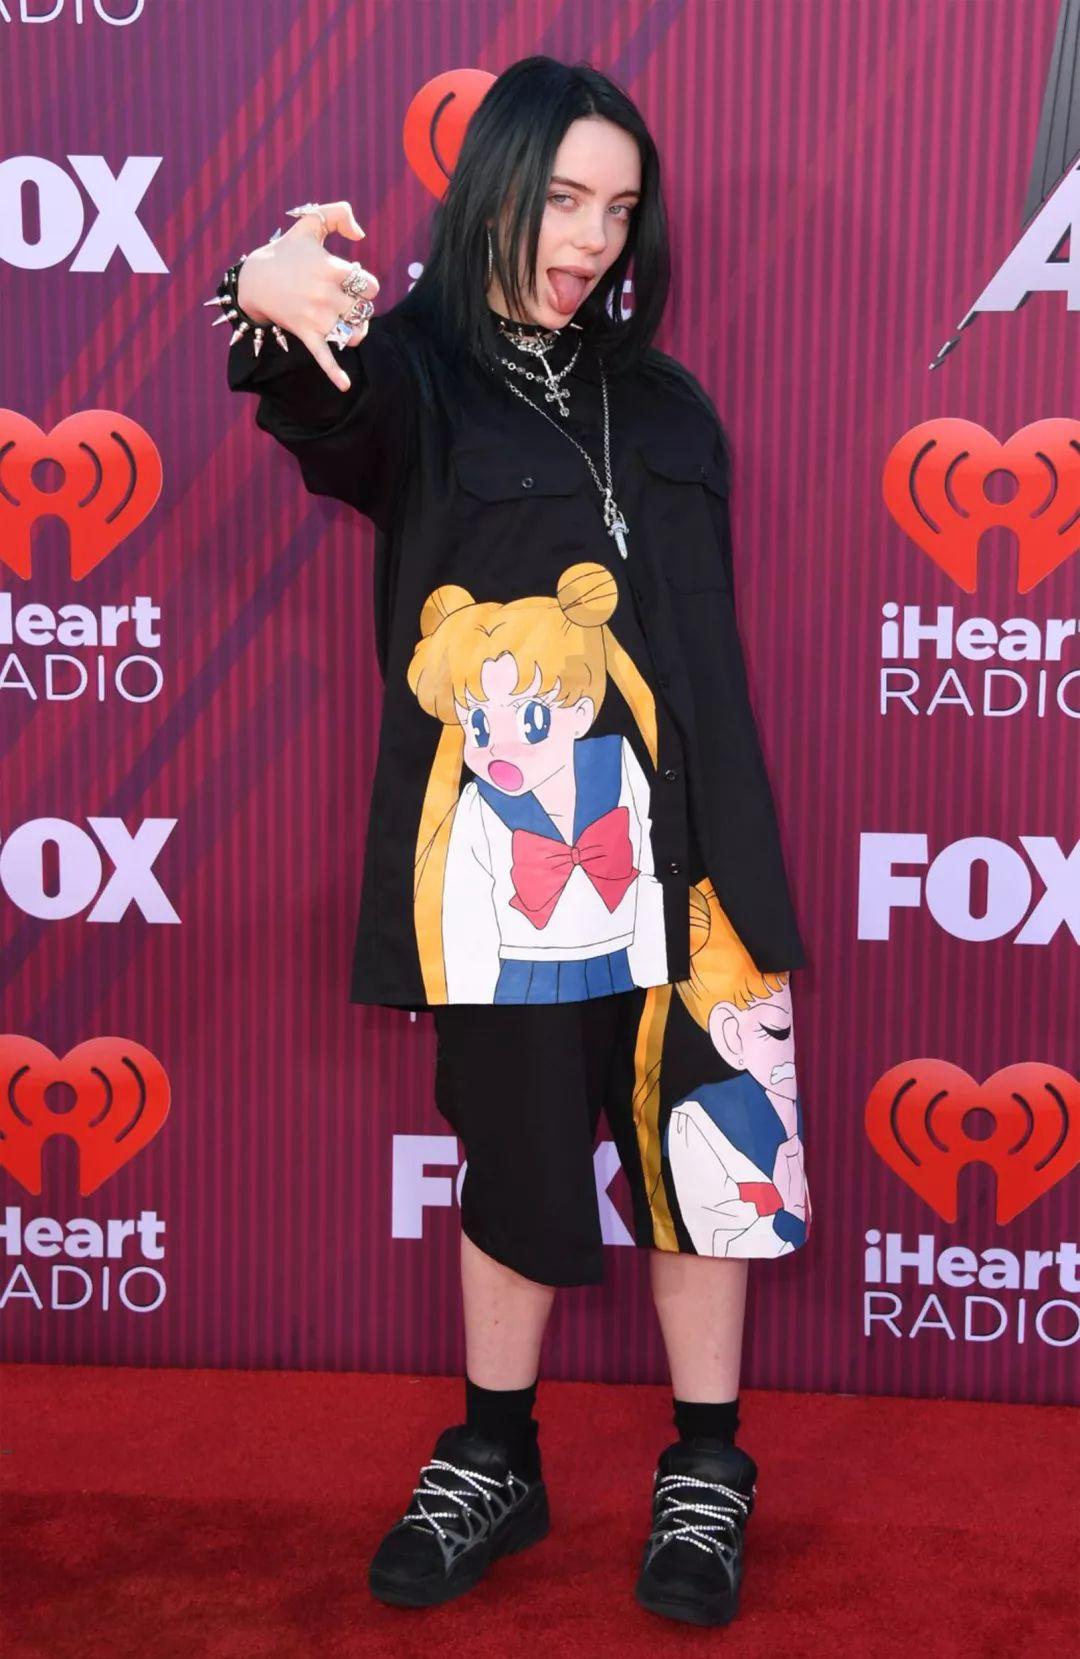 a8683f36eafa47c0a57d891abb75bfa8 - 超酷女歌手Billie Eilish 第一耳就爱上了她!